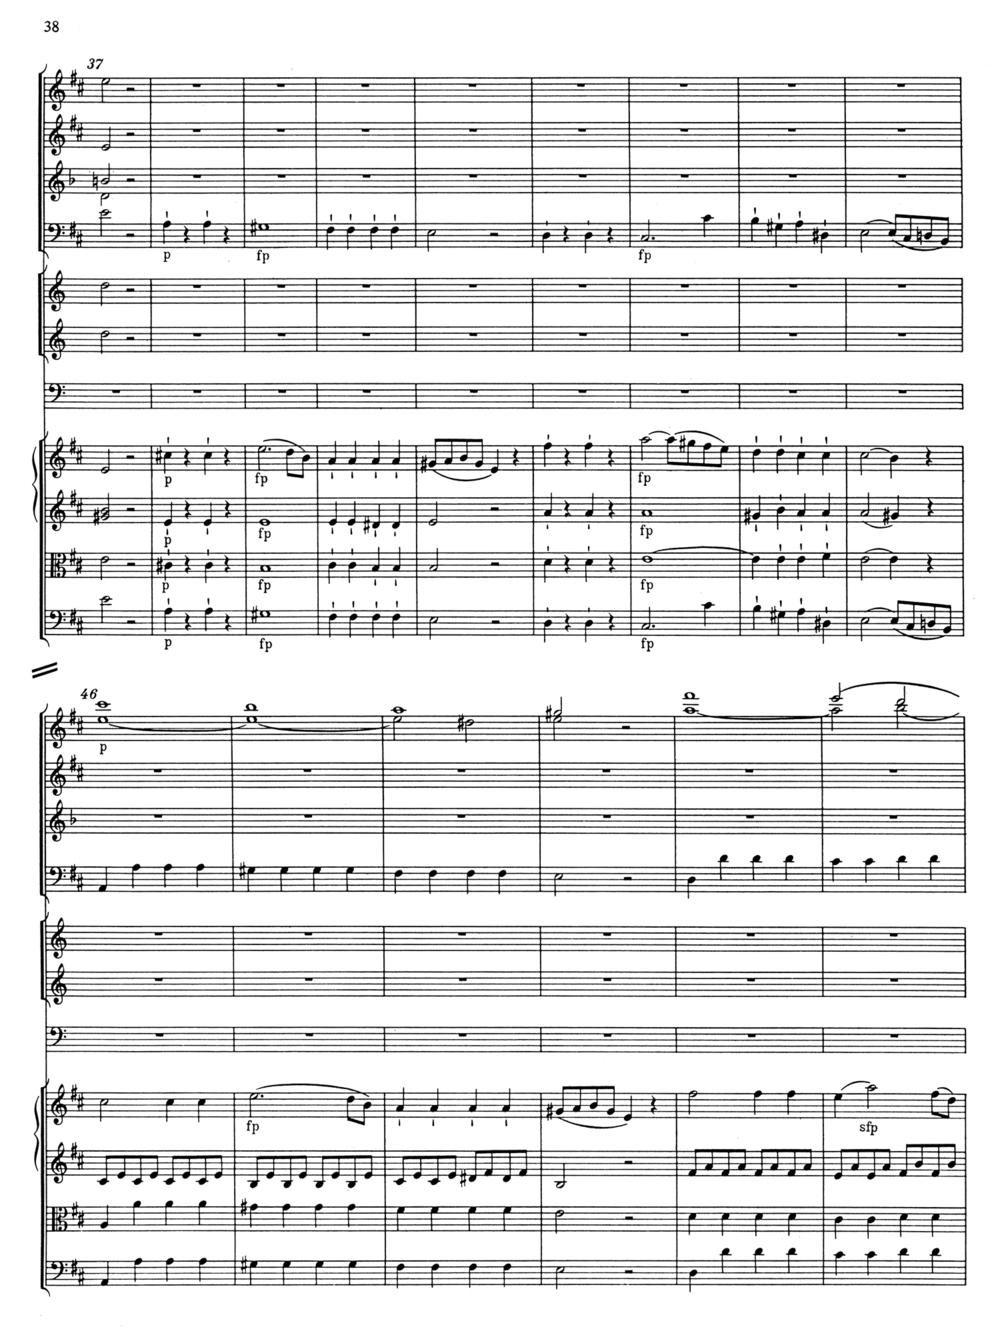 Haffner SCORE page 4.jpg